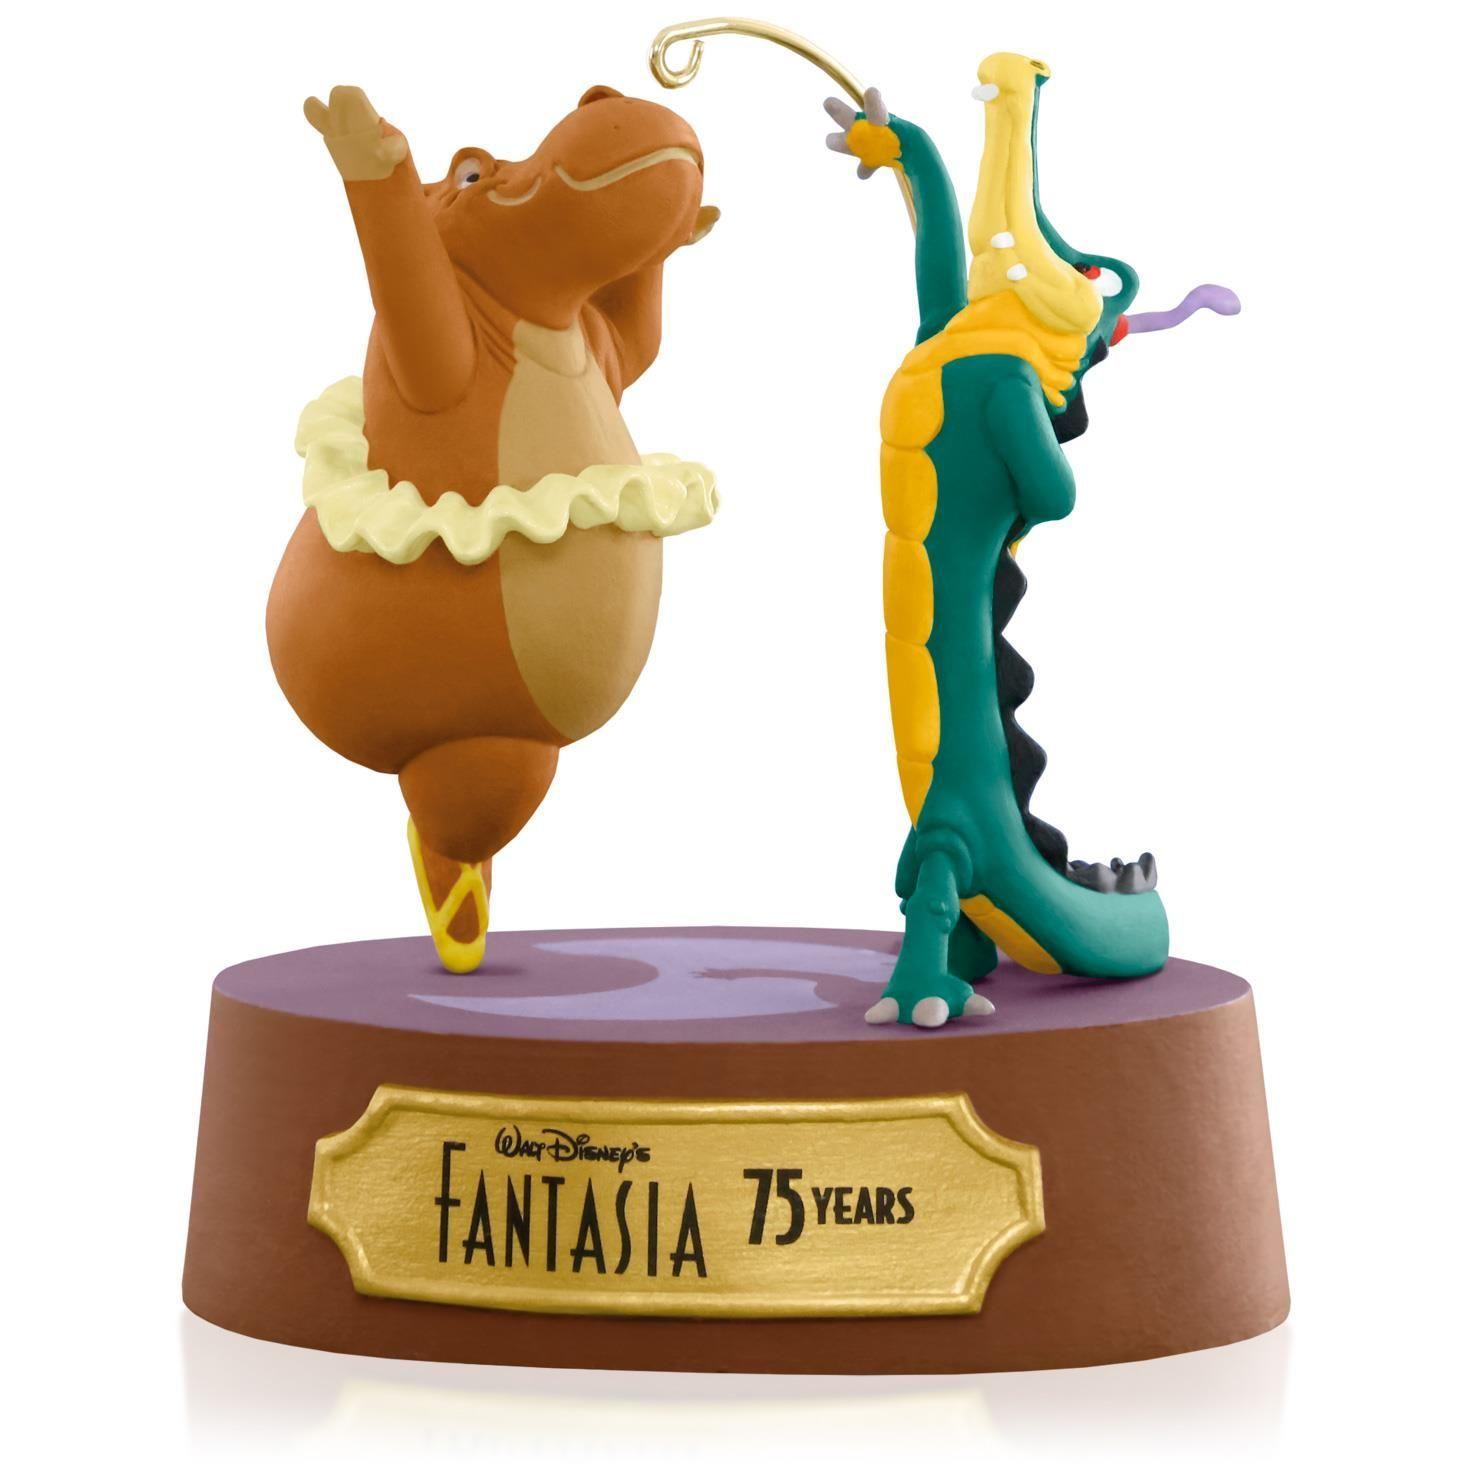 Hank & Dory Disney/Pixar Finding Dory Ornament | Hallmark ...